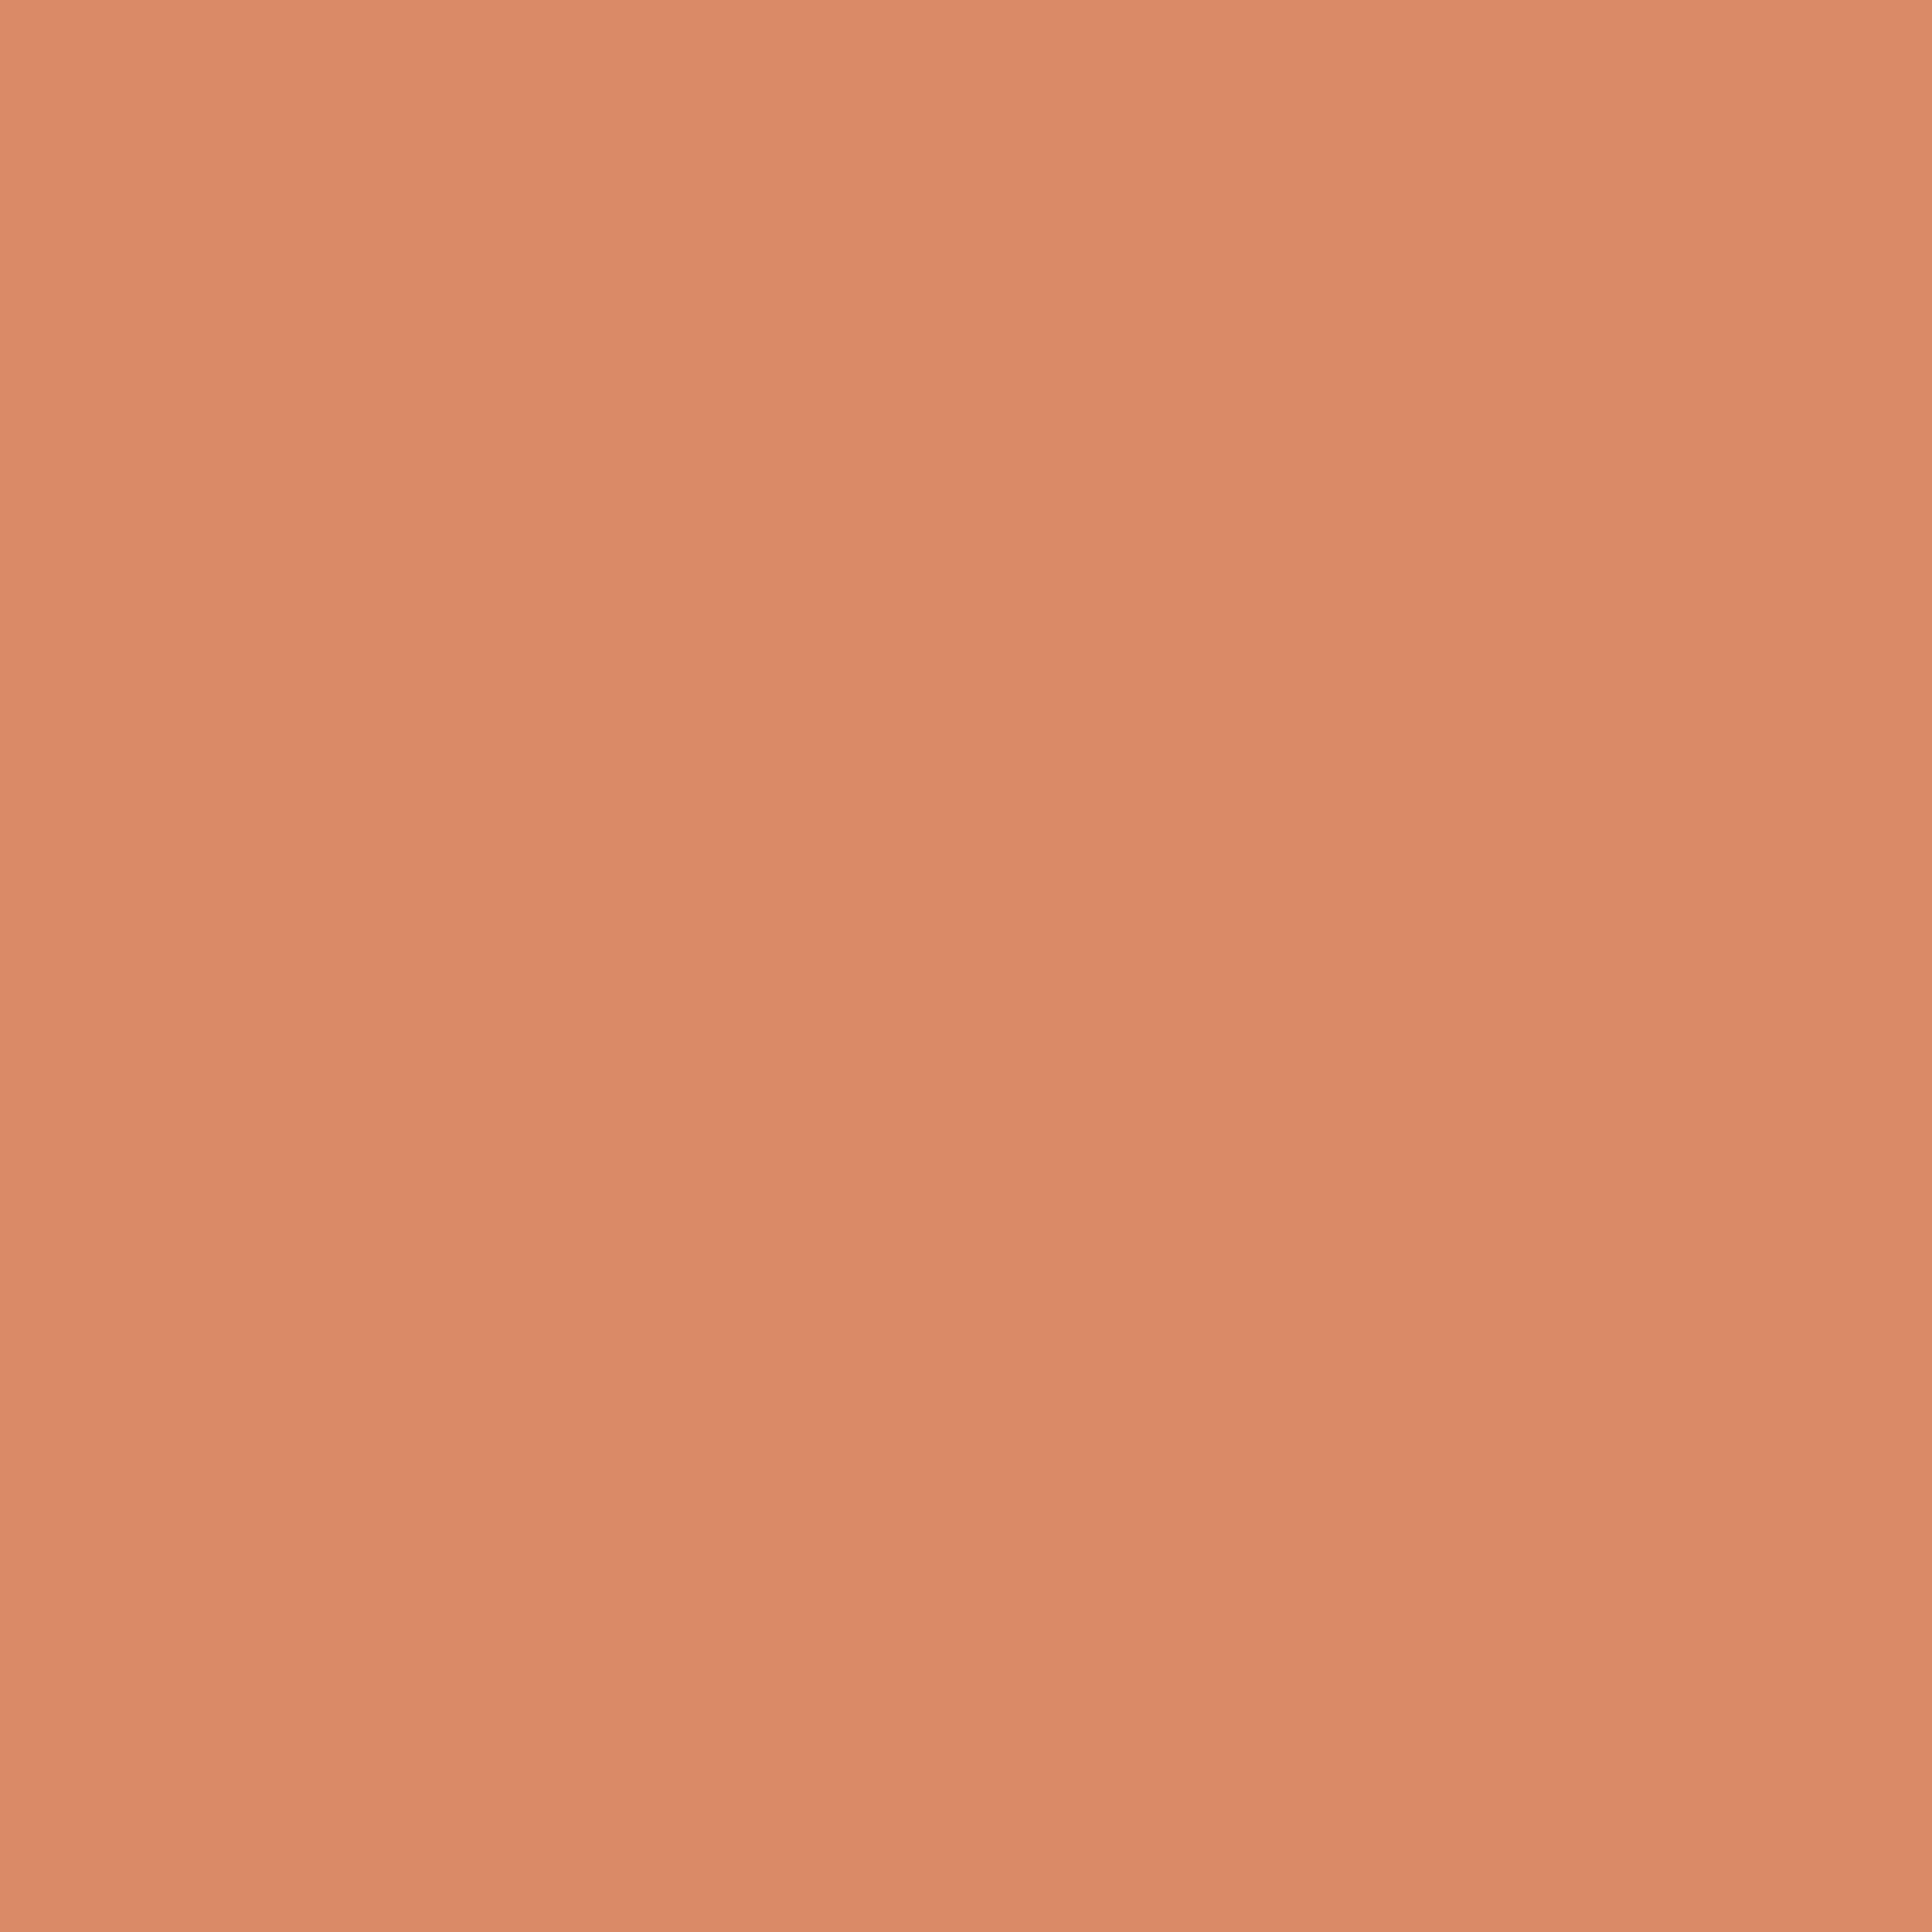 2048x2048 Copper Crayola Solid Color Background